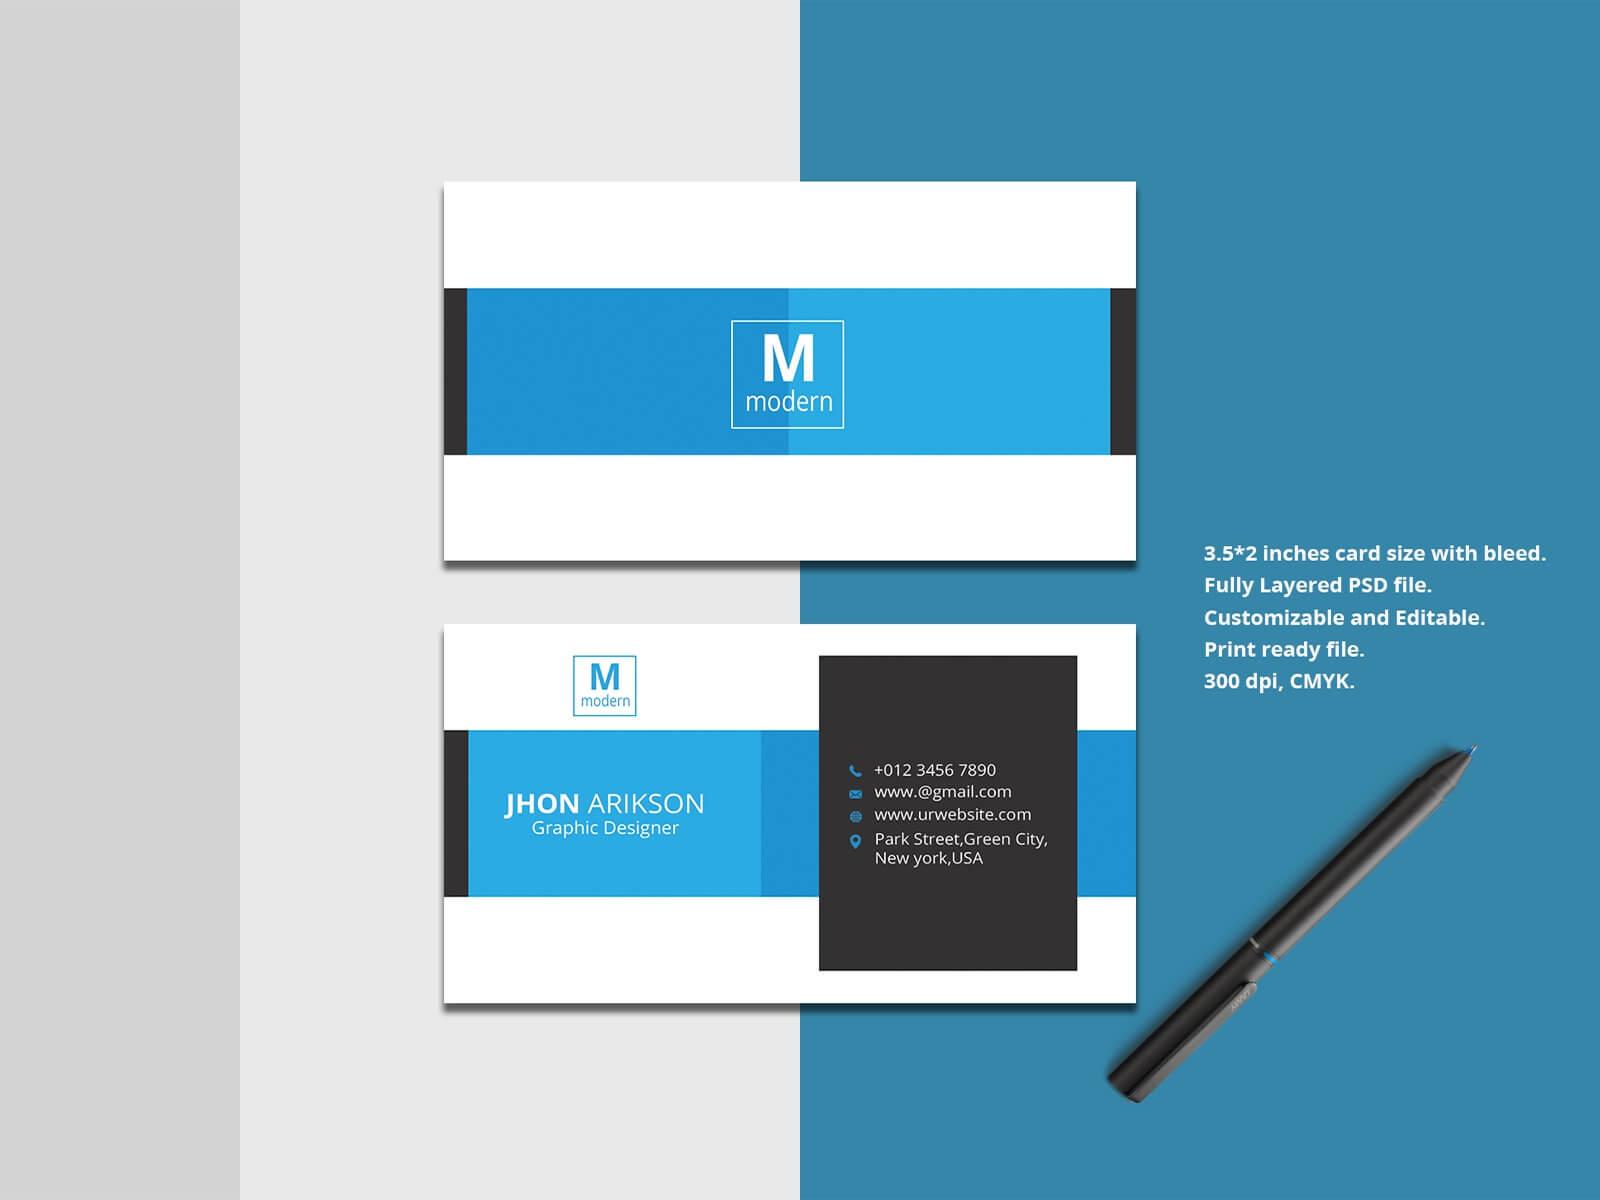 Business Card Templateakhtar Jahan On Dribbble Regarding Business Card Size Template Psd